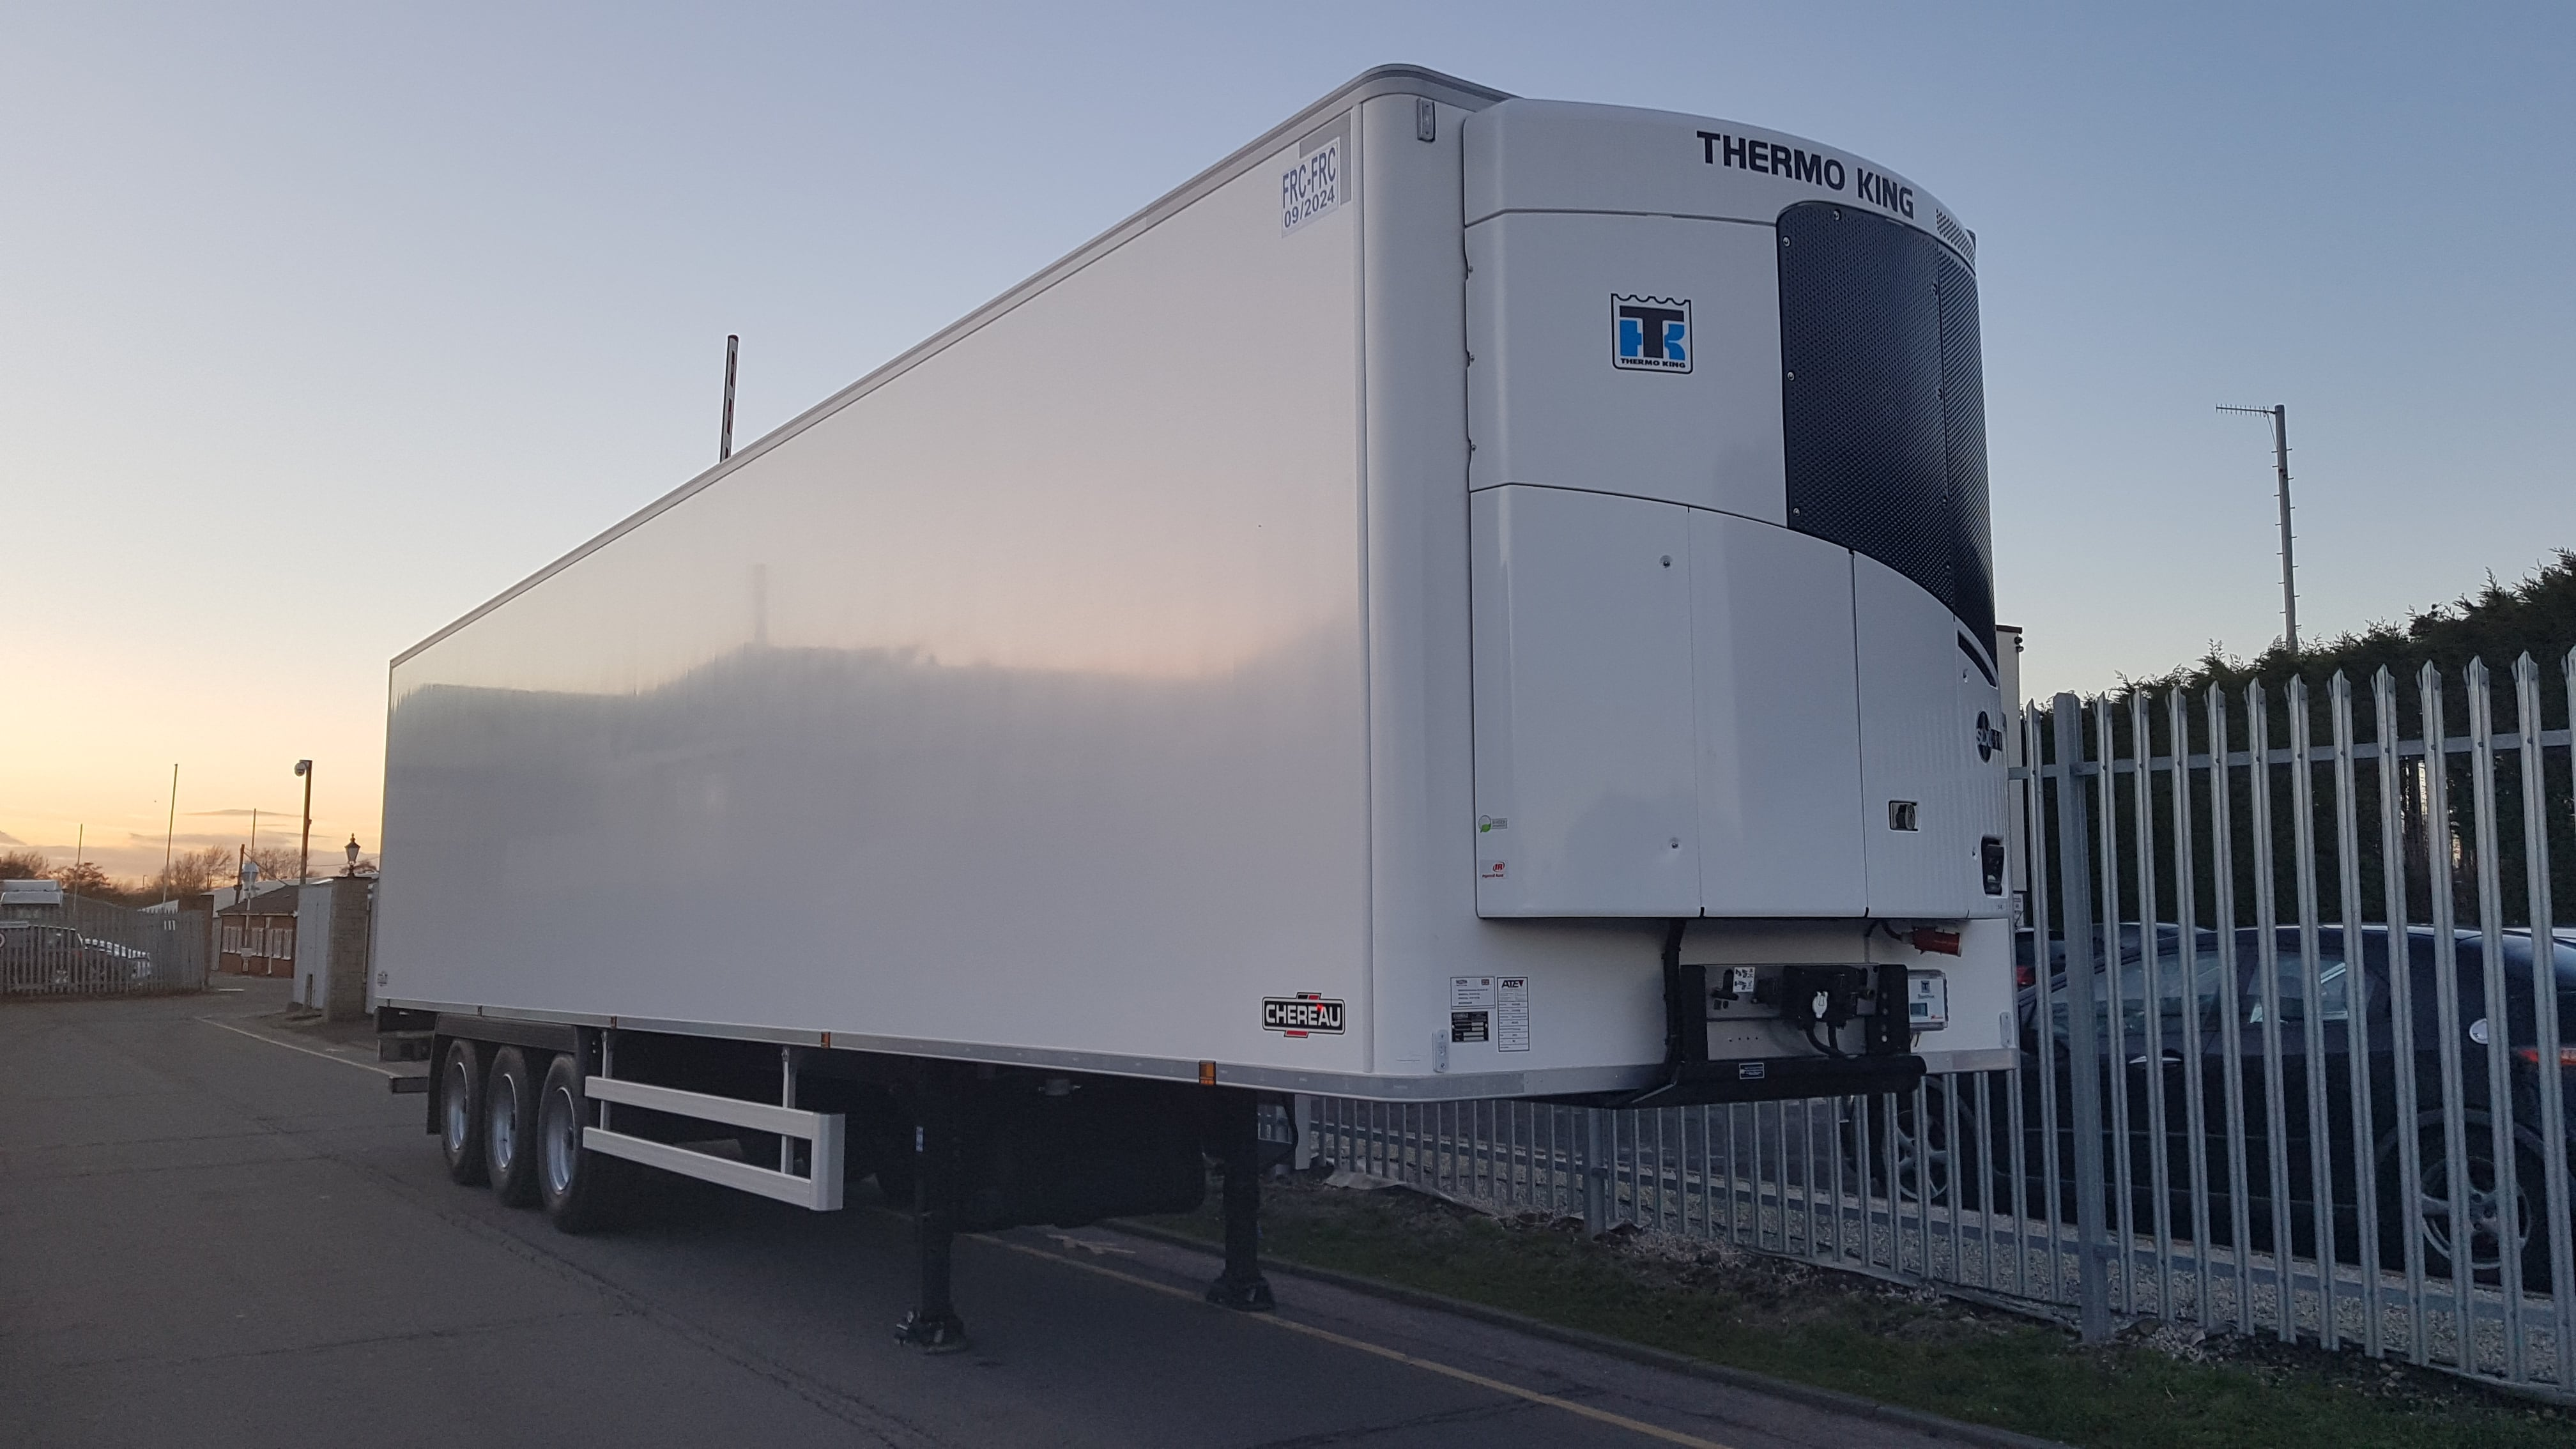 BRAND NEW 2018 Dual Temp Chereau Fridge, ThermoKing SLXi Spectrum fridges, BPW axles, drum brakes, Solid Internal bulkheads, full chassis' resin floors, Barn doors, 2.6m internal height. Full manufacturer's warranty applies.